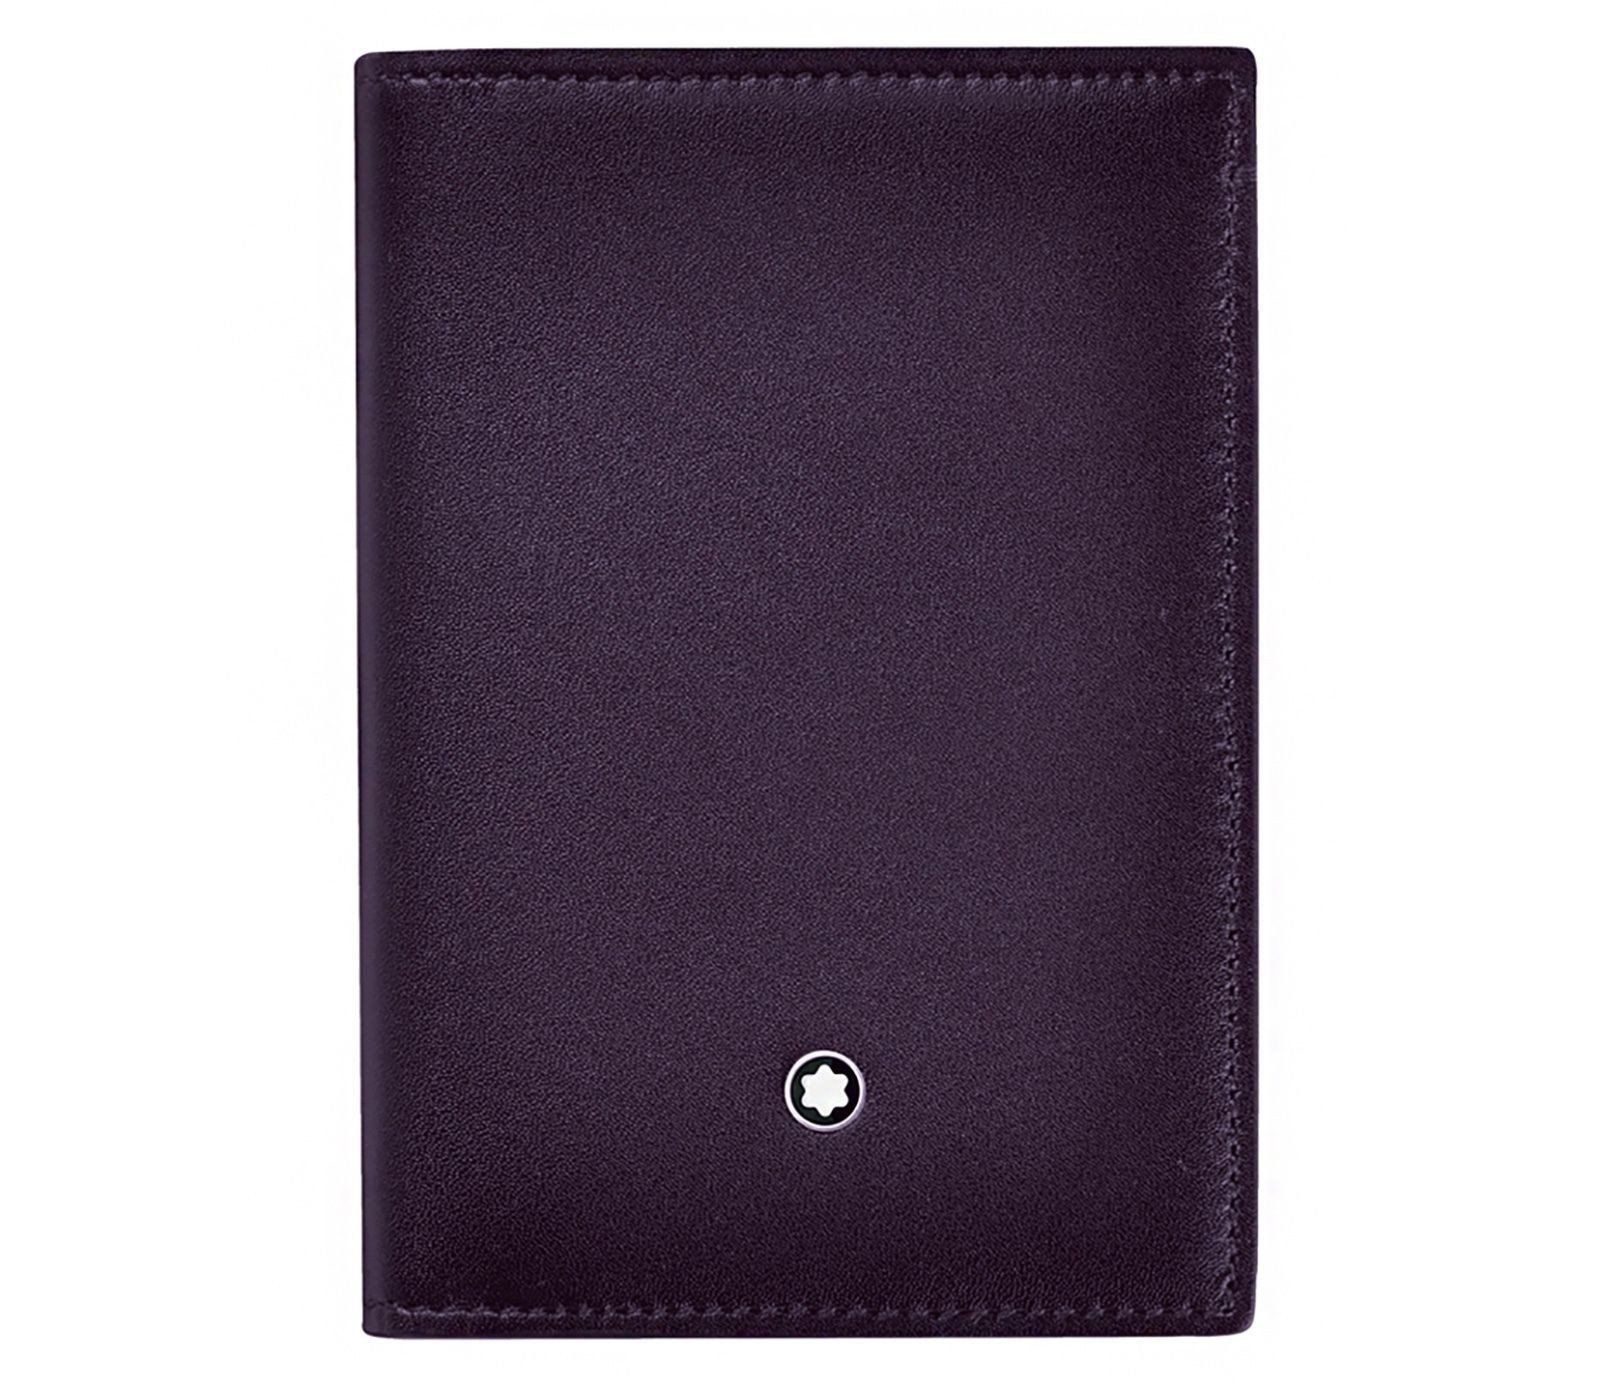 Montblanc 114511 Meisterstuck Sfumato Purple Leather Business Card ...